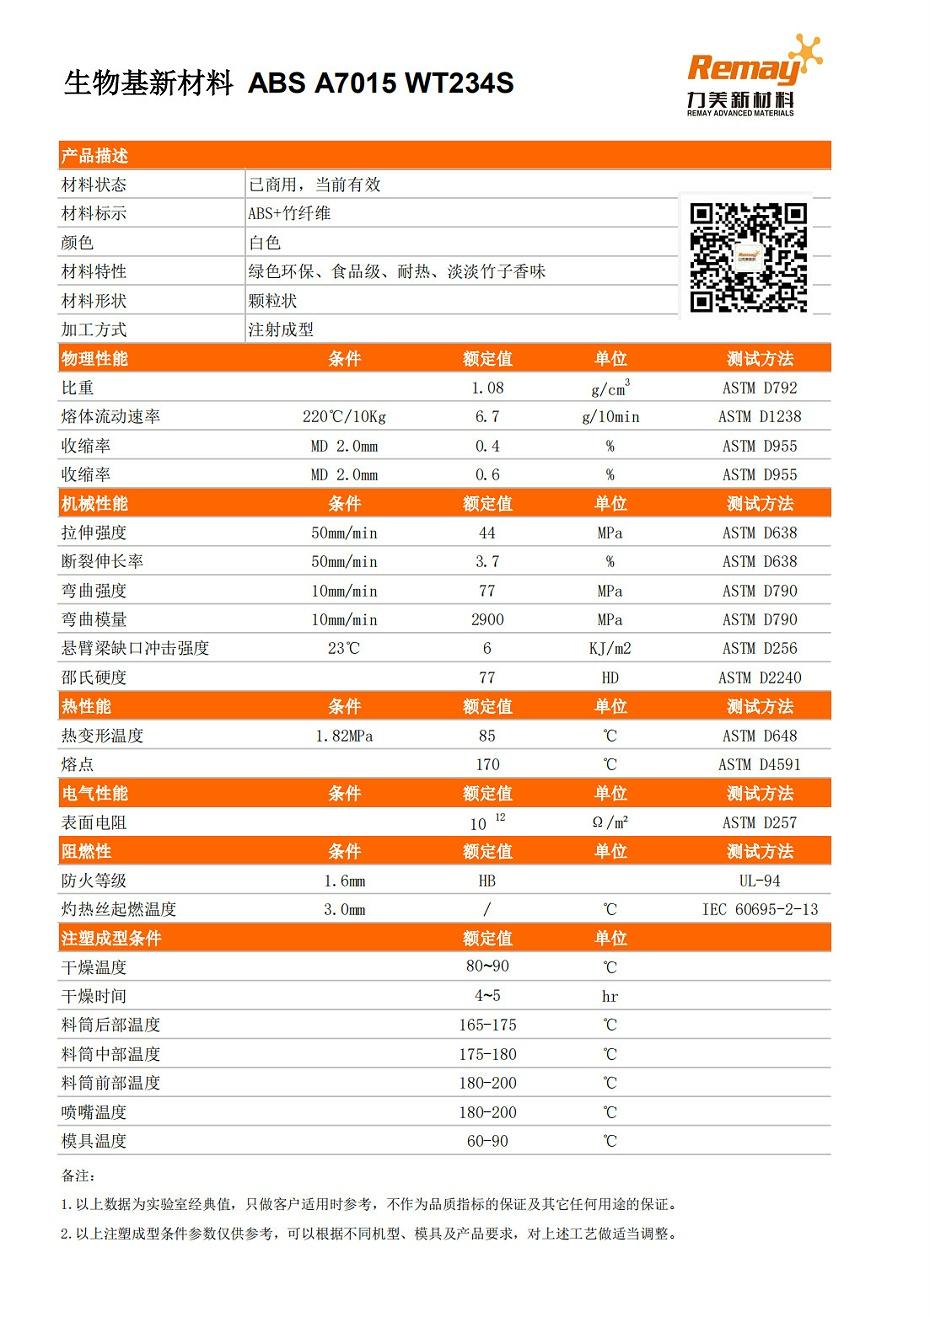 ABS竹纤维物性表